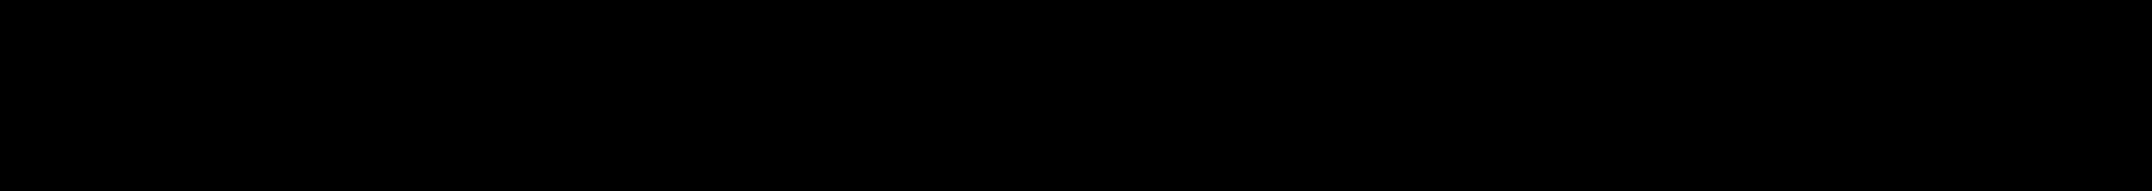 Sánchez SemiBold Italic